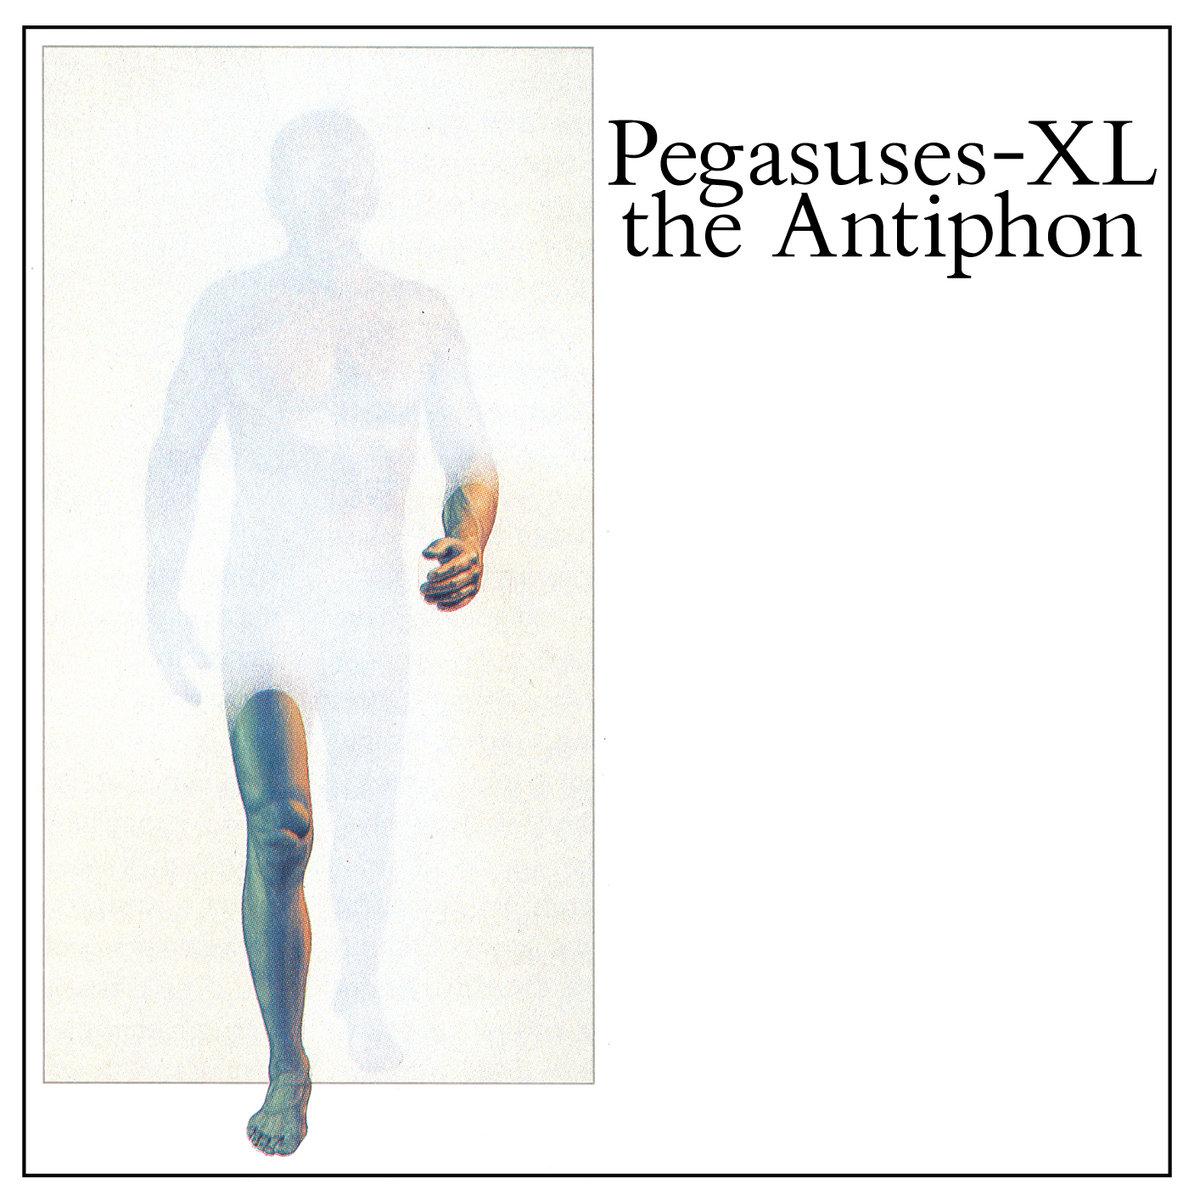 Pegasuses-XL - The Antiphon